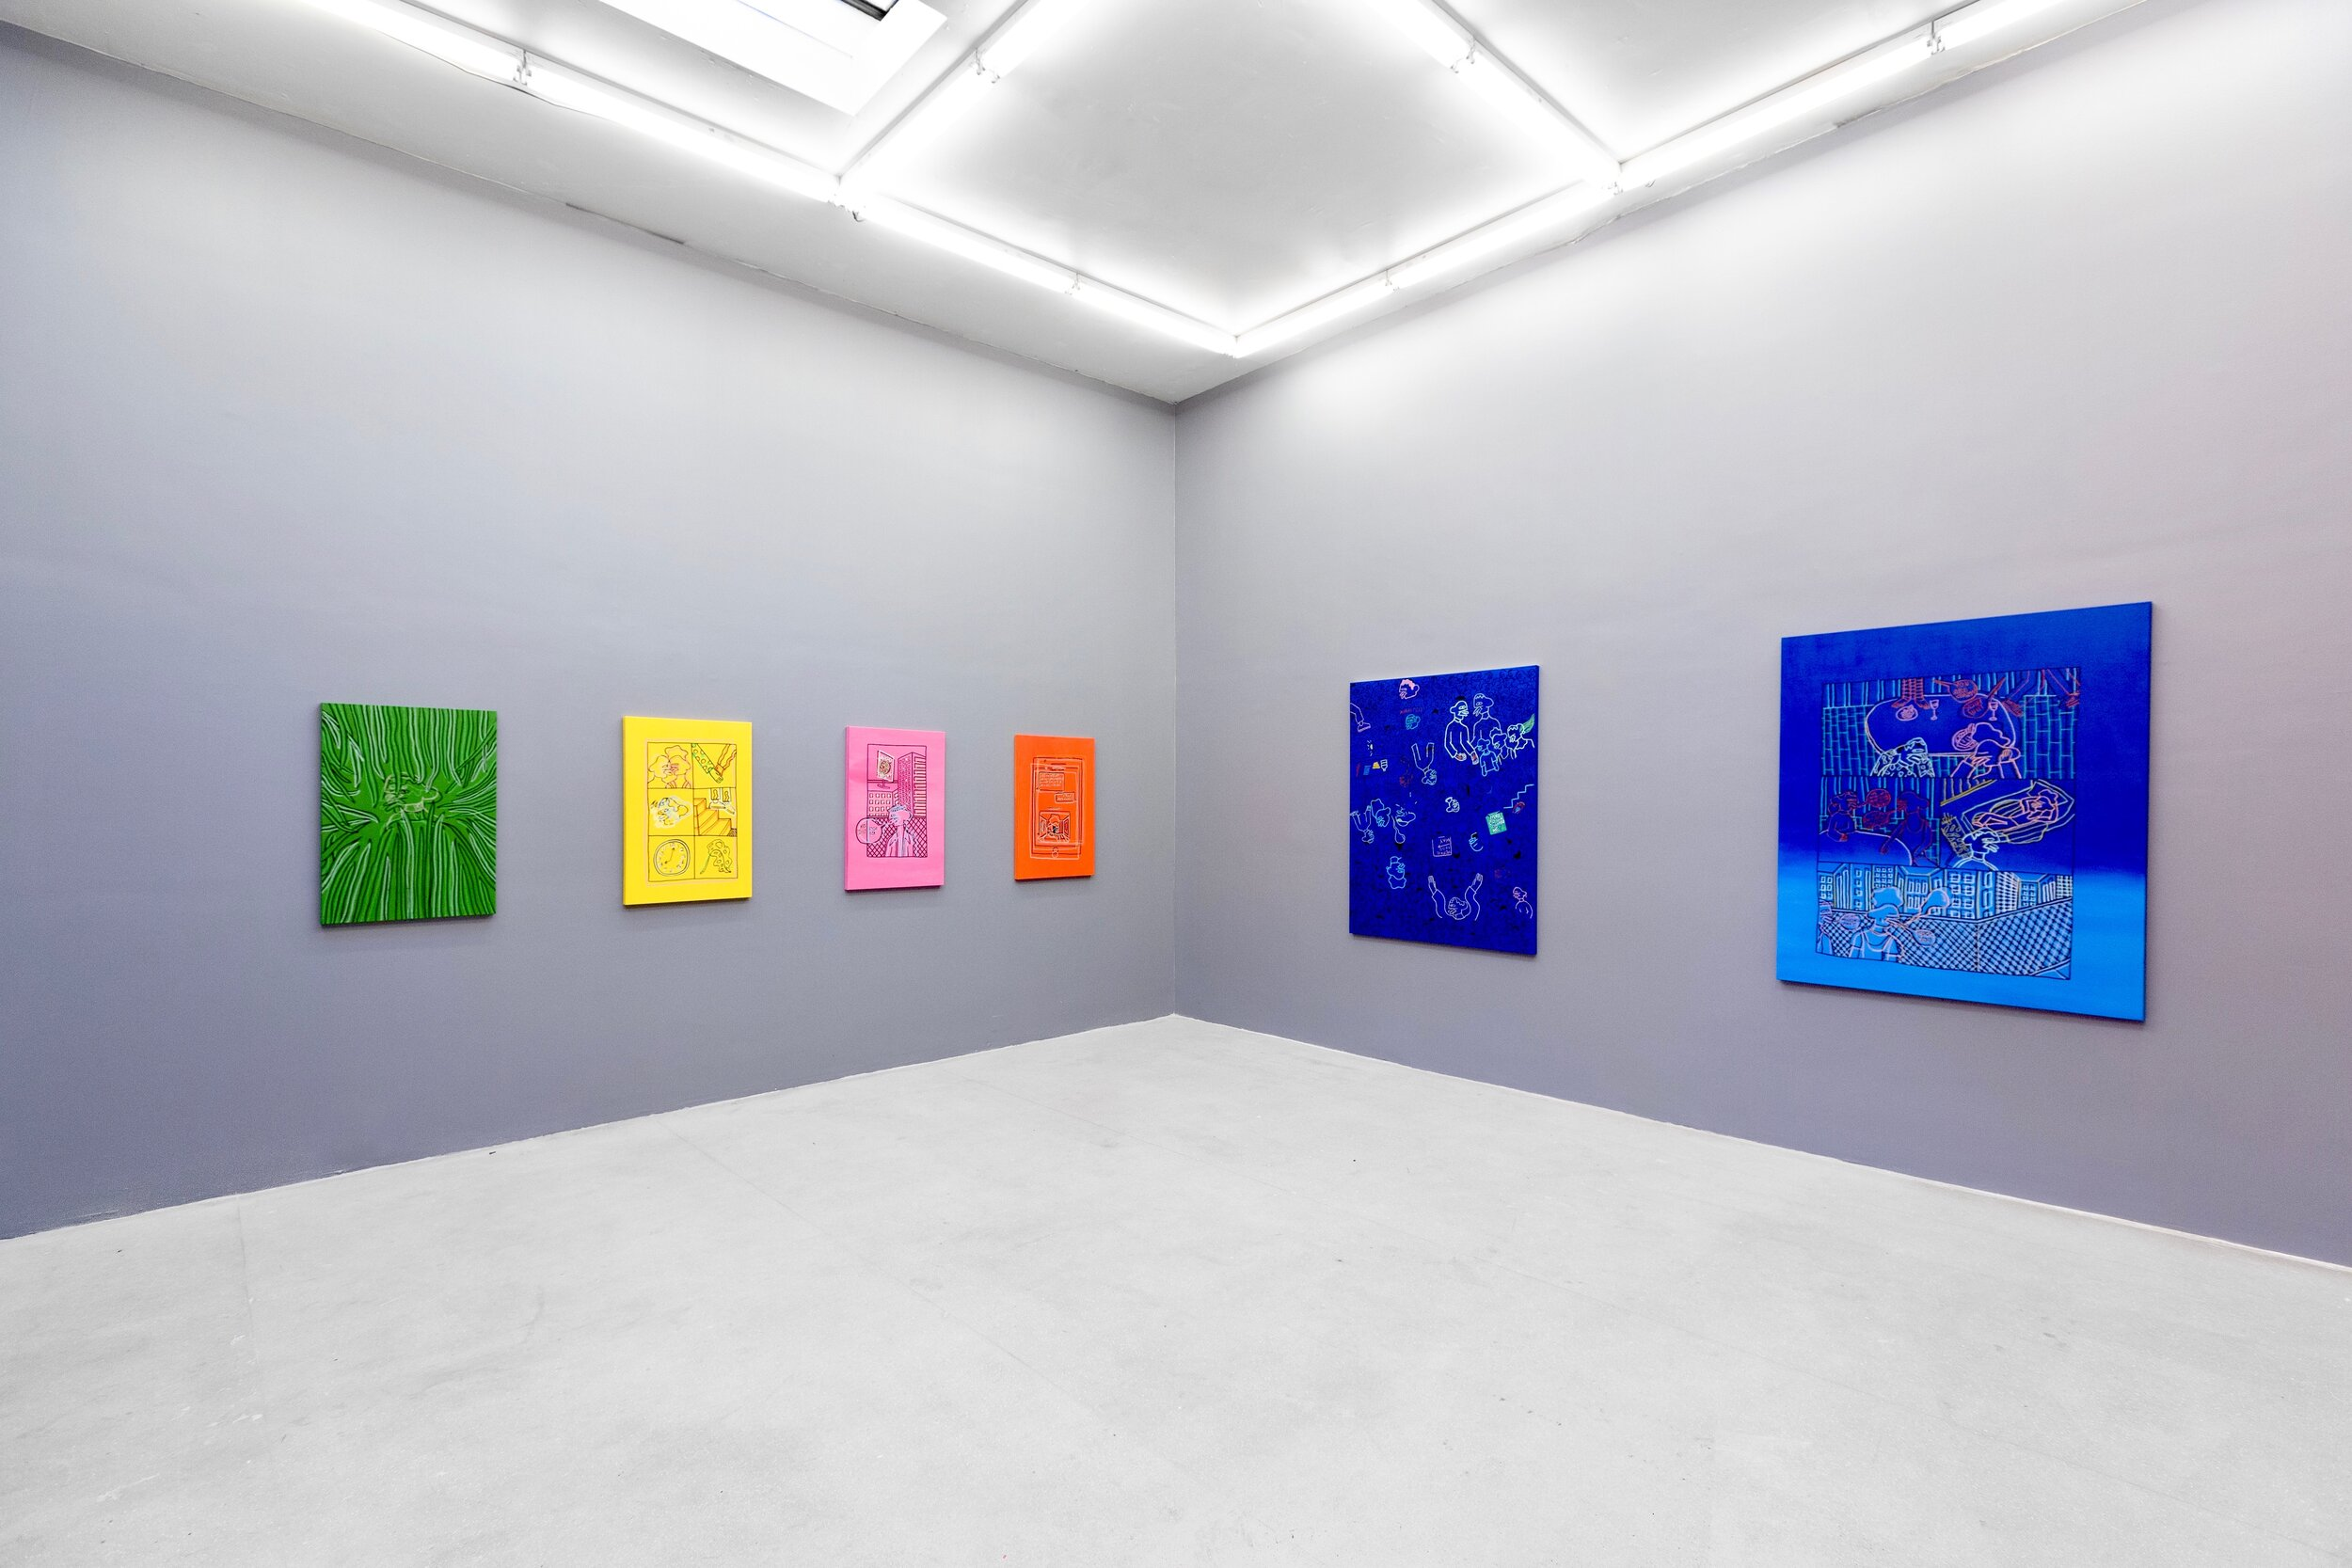 (above) Installation view |  Conversation Derelict  | Solo Exhibition by Corey Wash